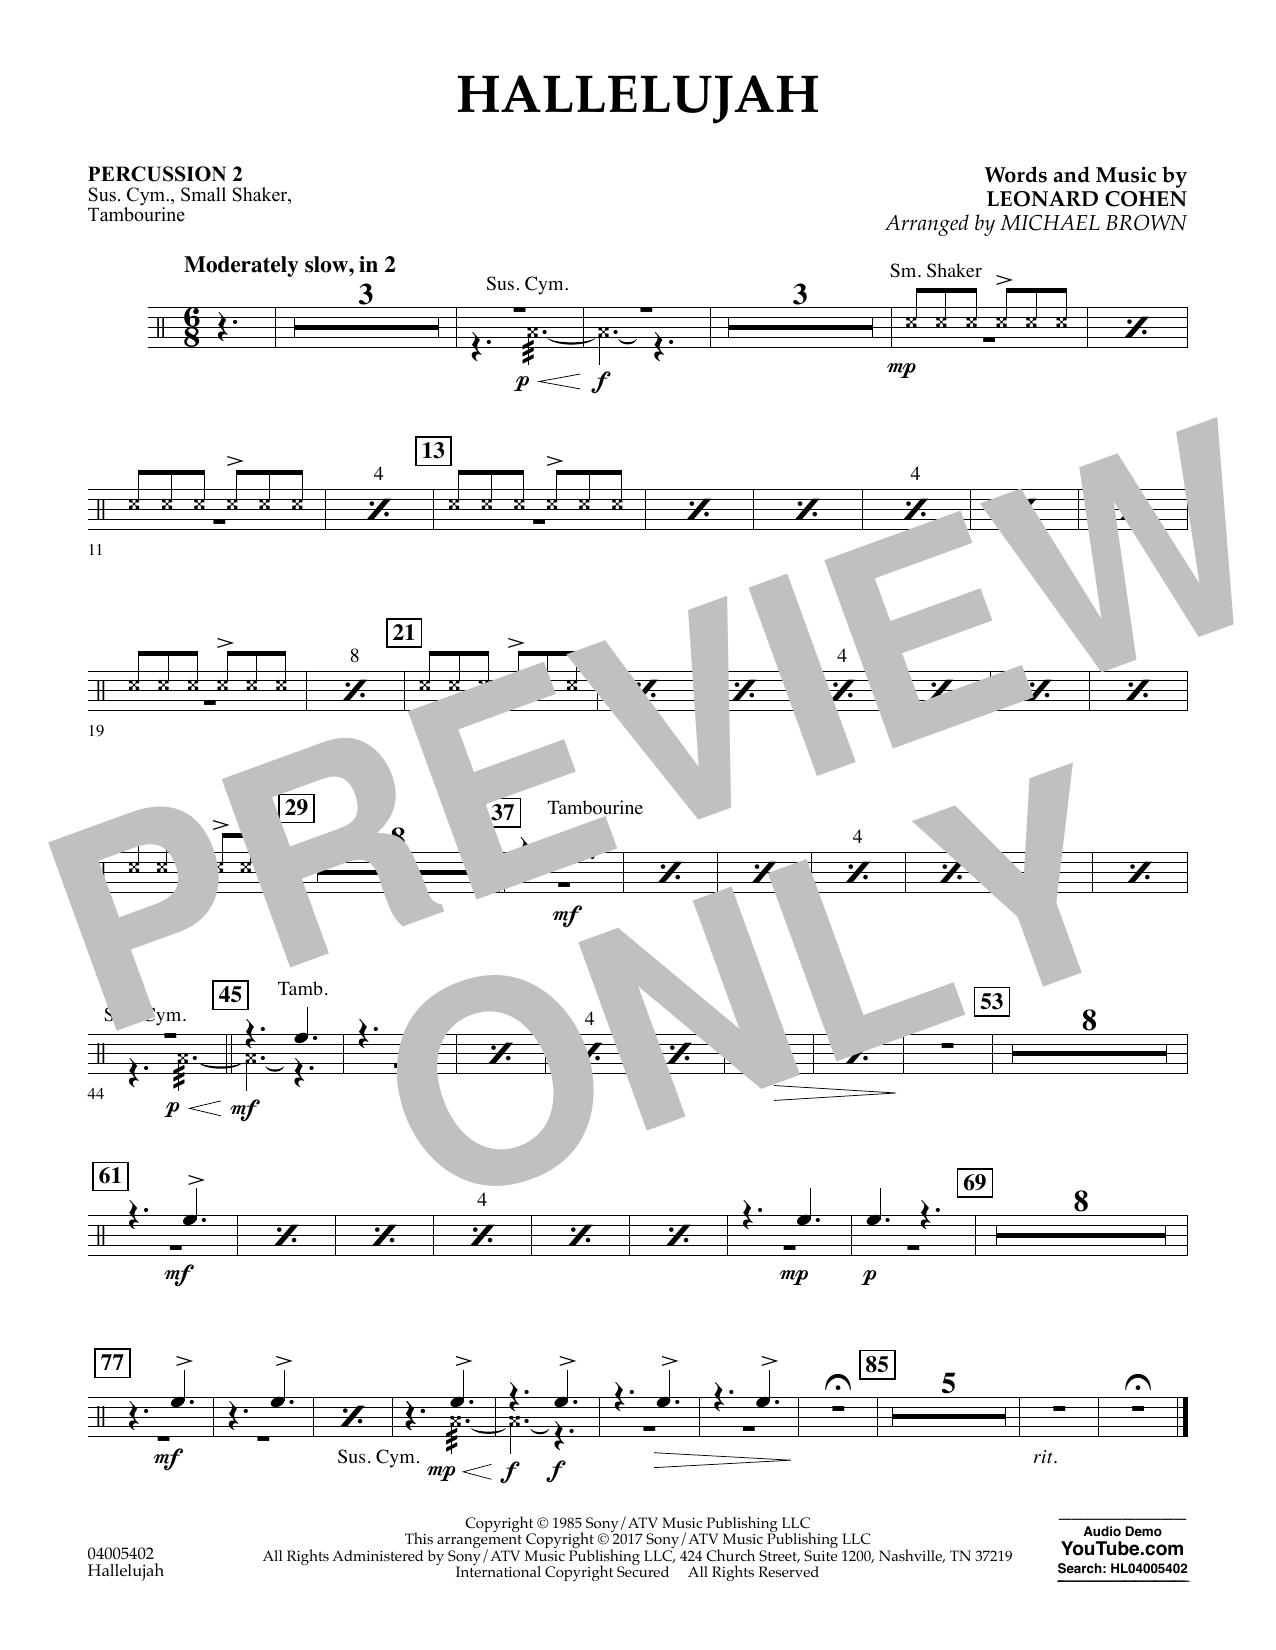 Hallelujah - Percussion 2 (Flex-Band)